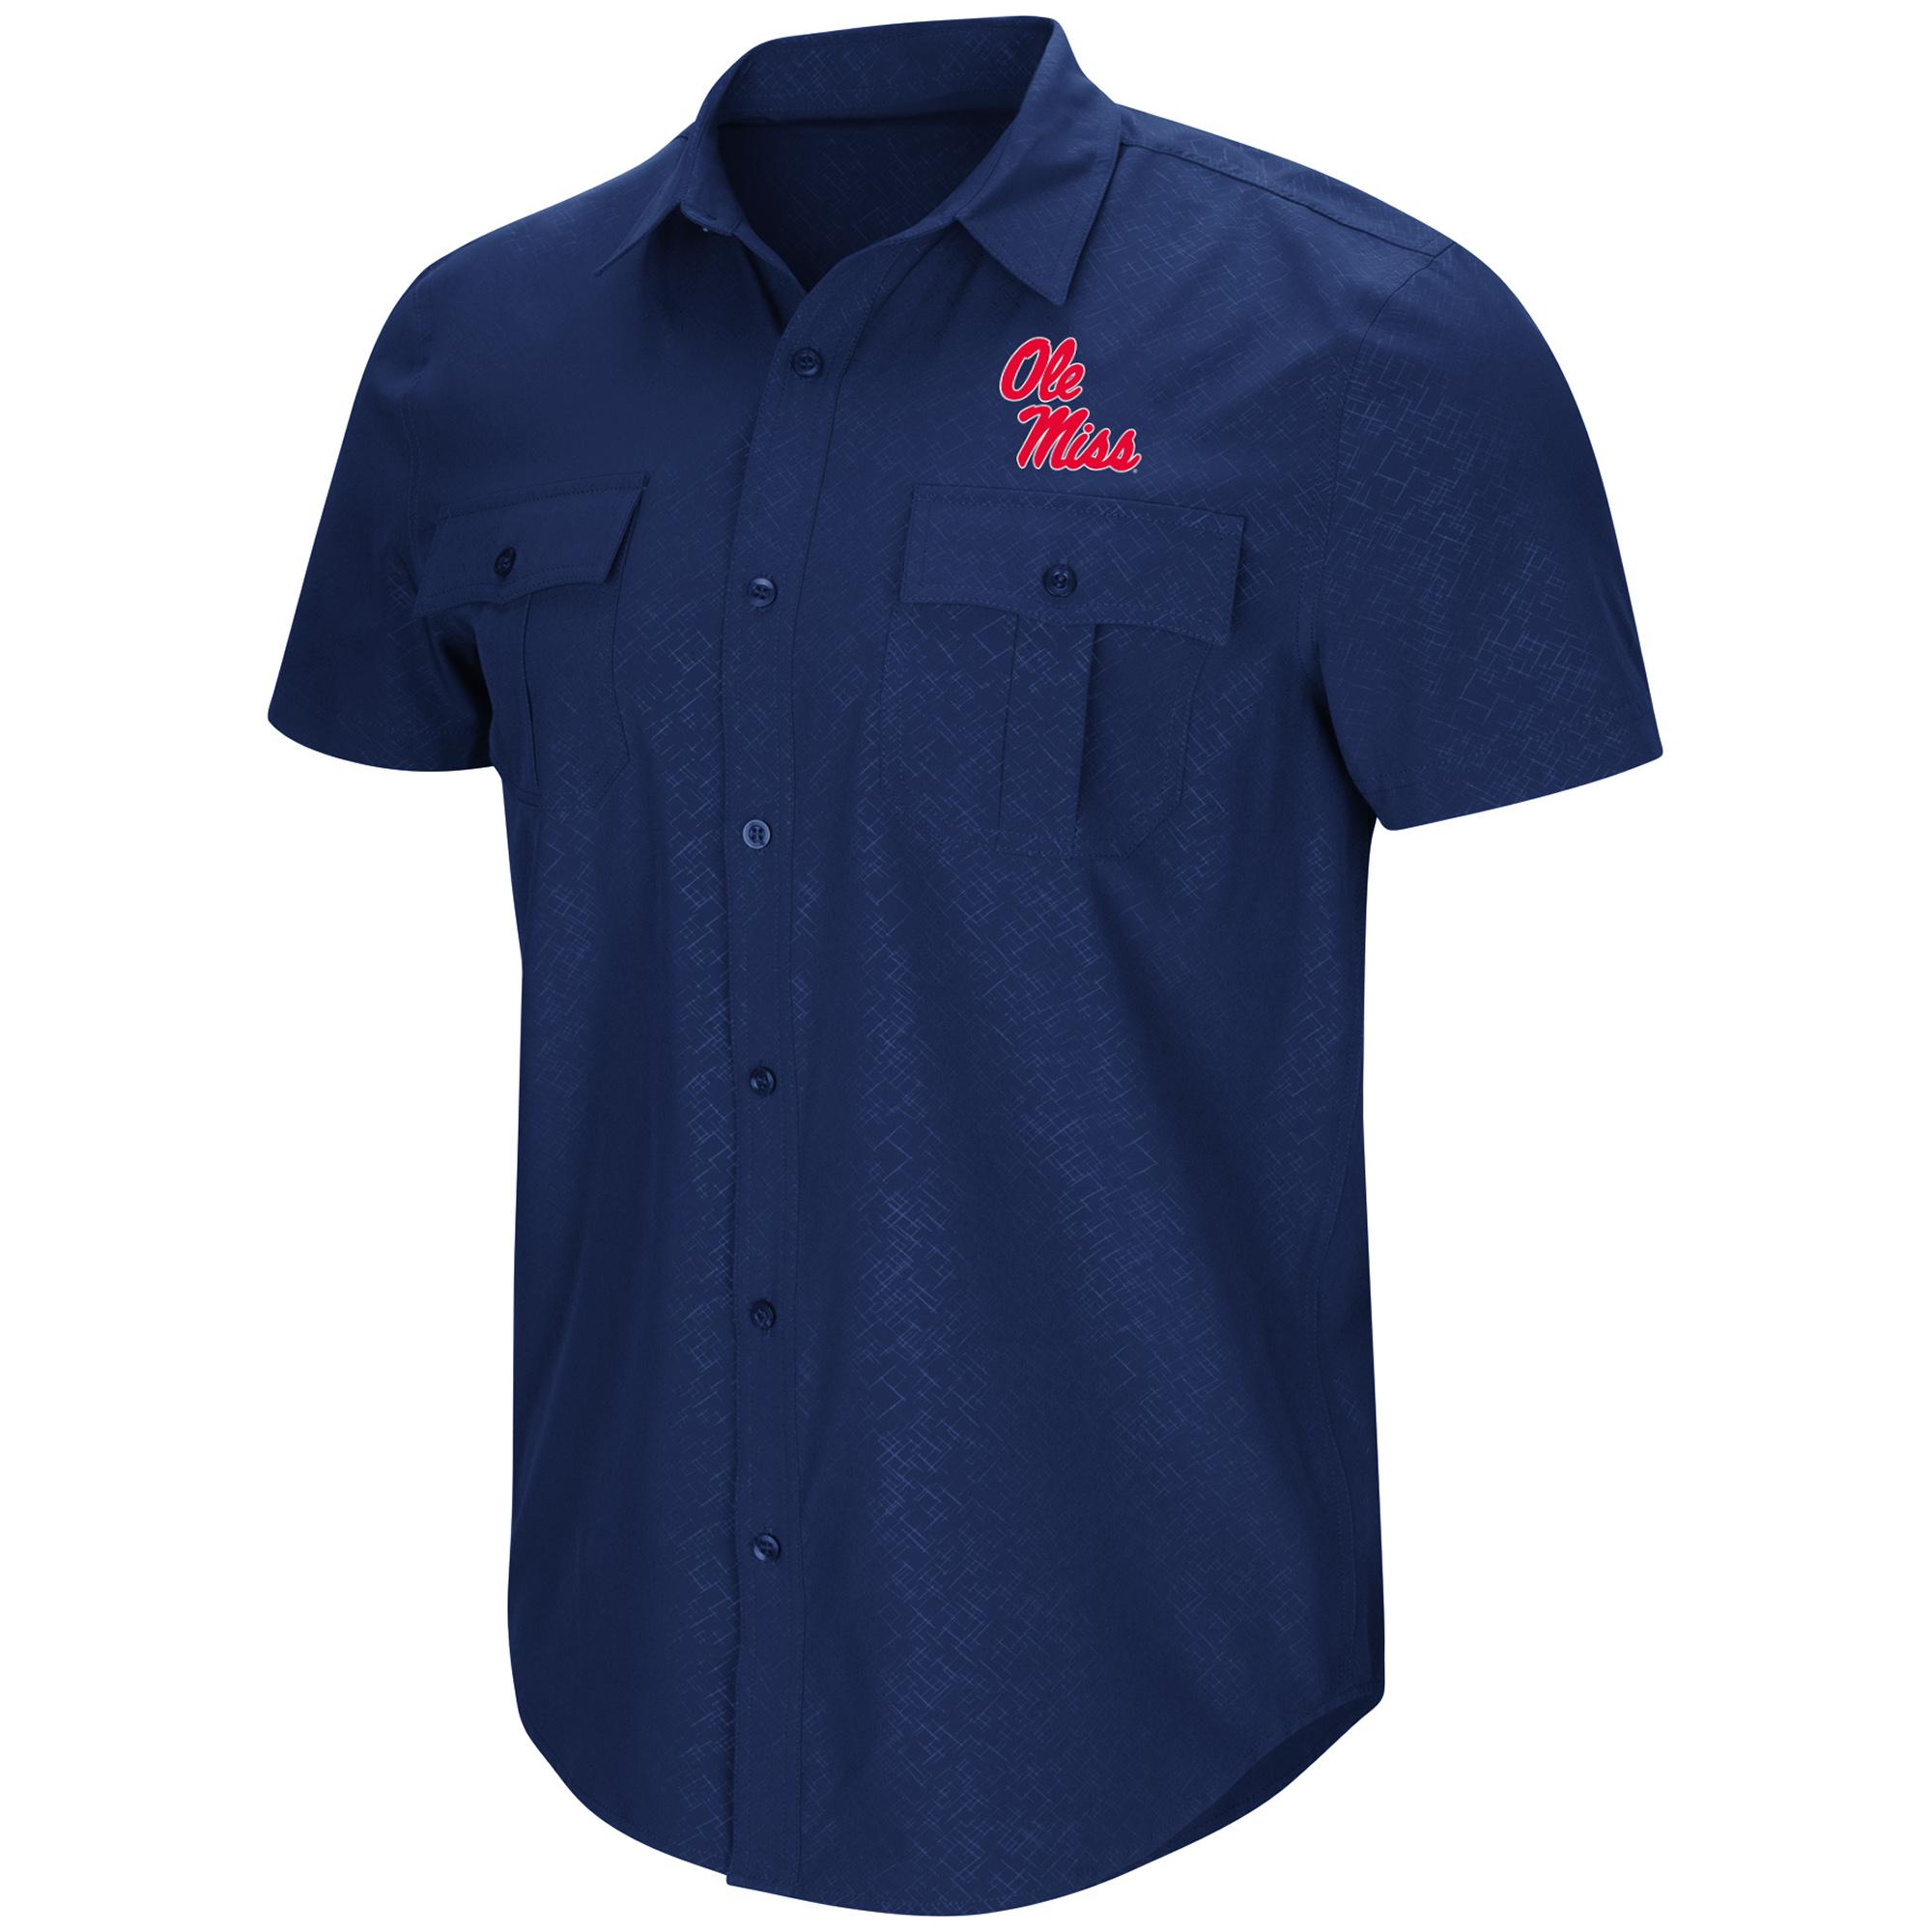 Mens Roberto Woven Shirt